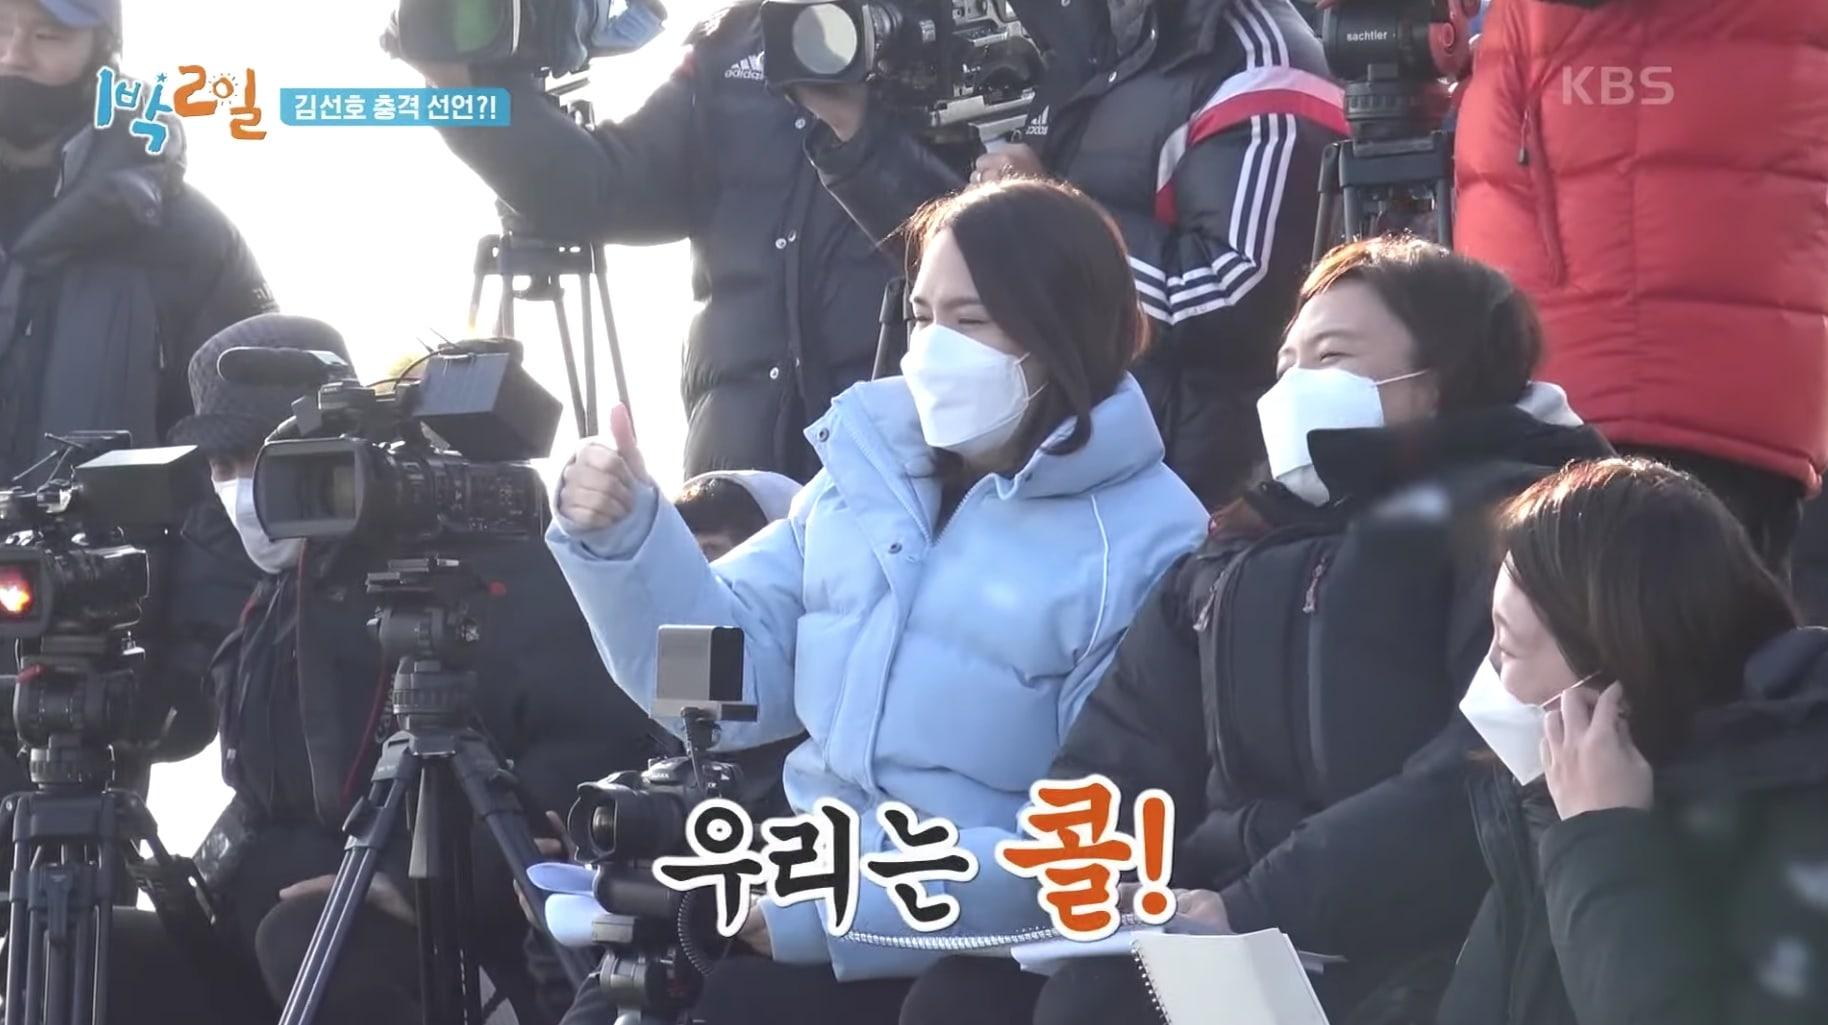 """2 Days & 1 Night Season 4"": Kim Seon Ho closes all talks about him"